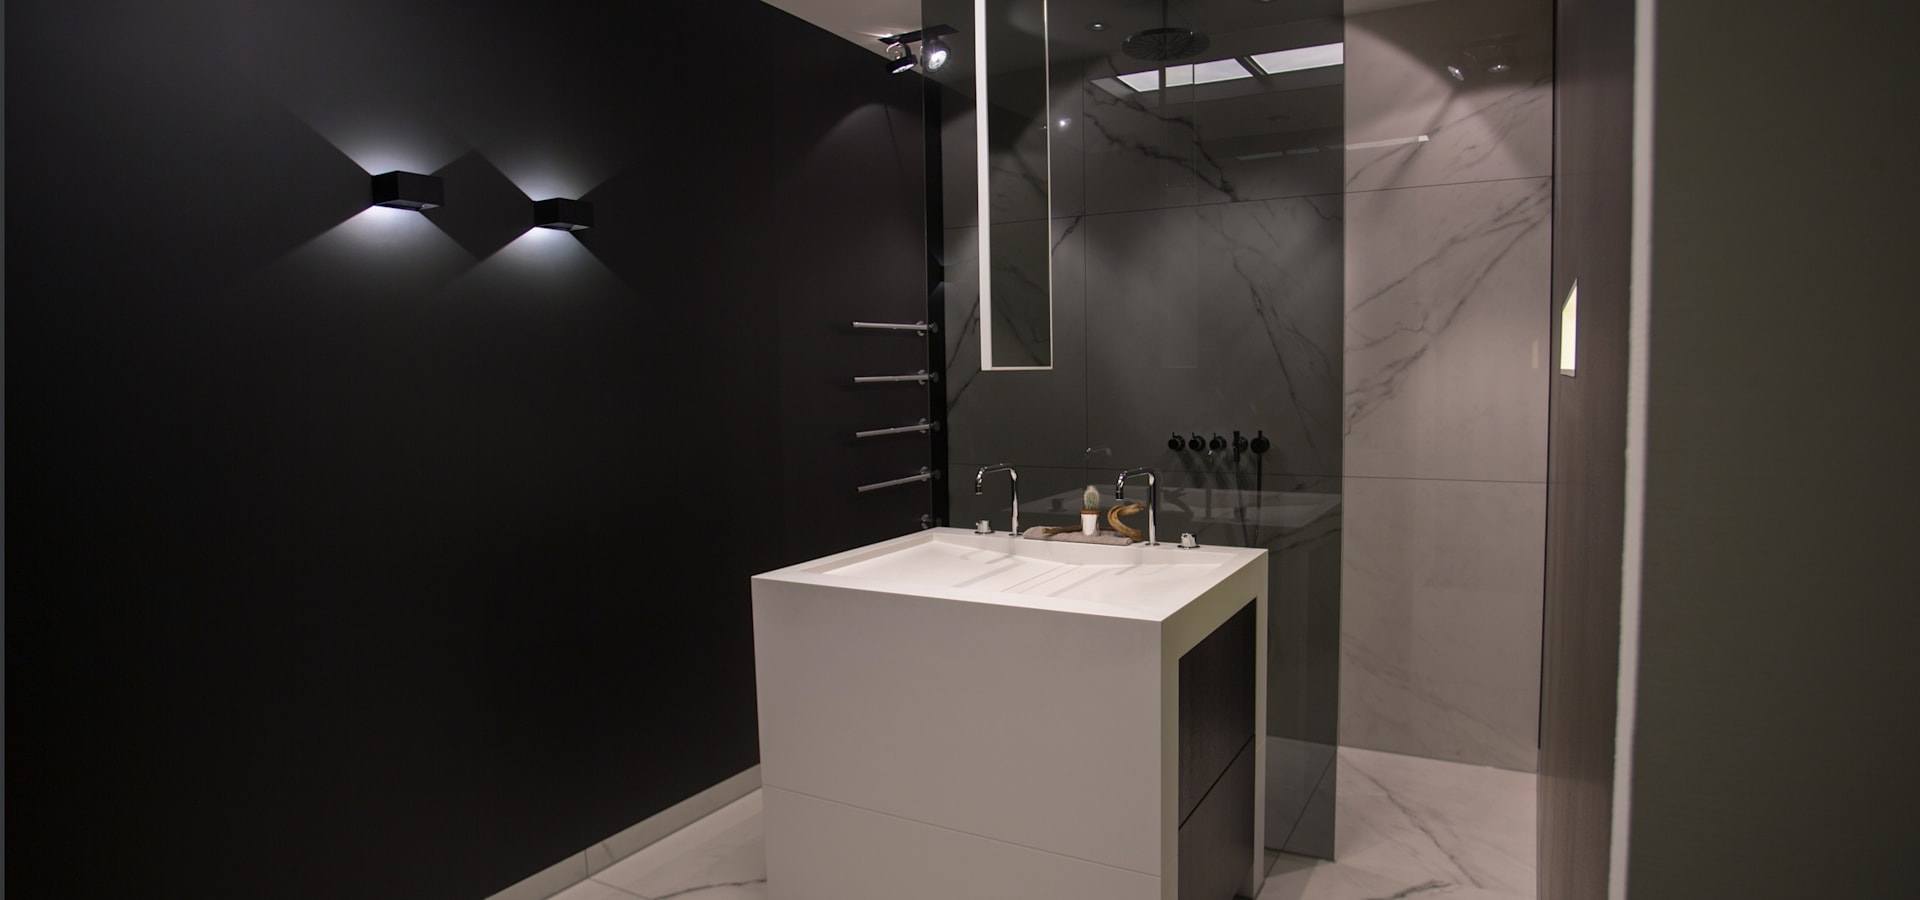 De eerste kamer badkamerspeciaalzaak in barneveld homify - Kleur kamer volwassen foto ...